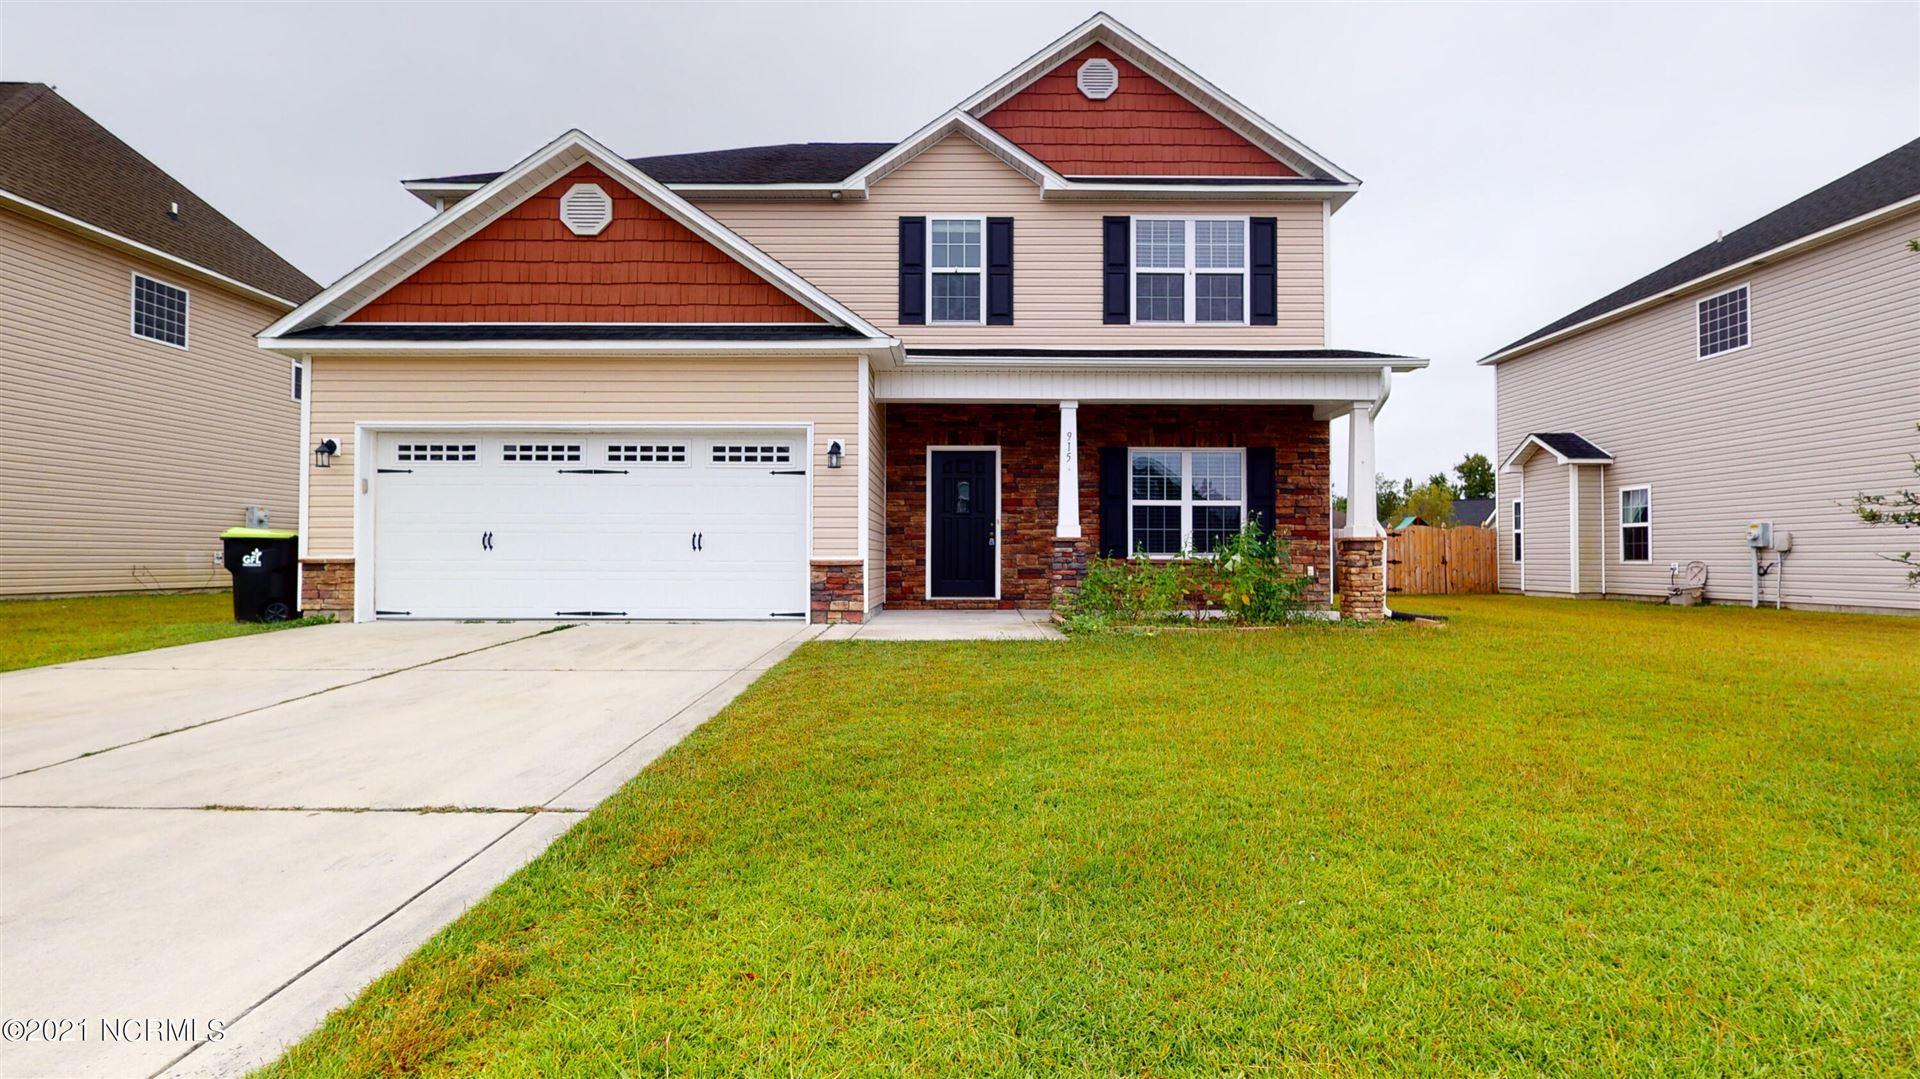 Photo of 915 Roswell Lane, Jacksonville, NC 28546 (MLS # 100288976)